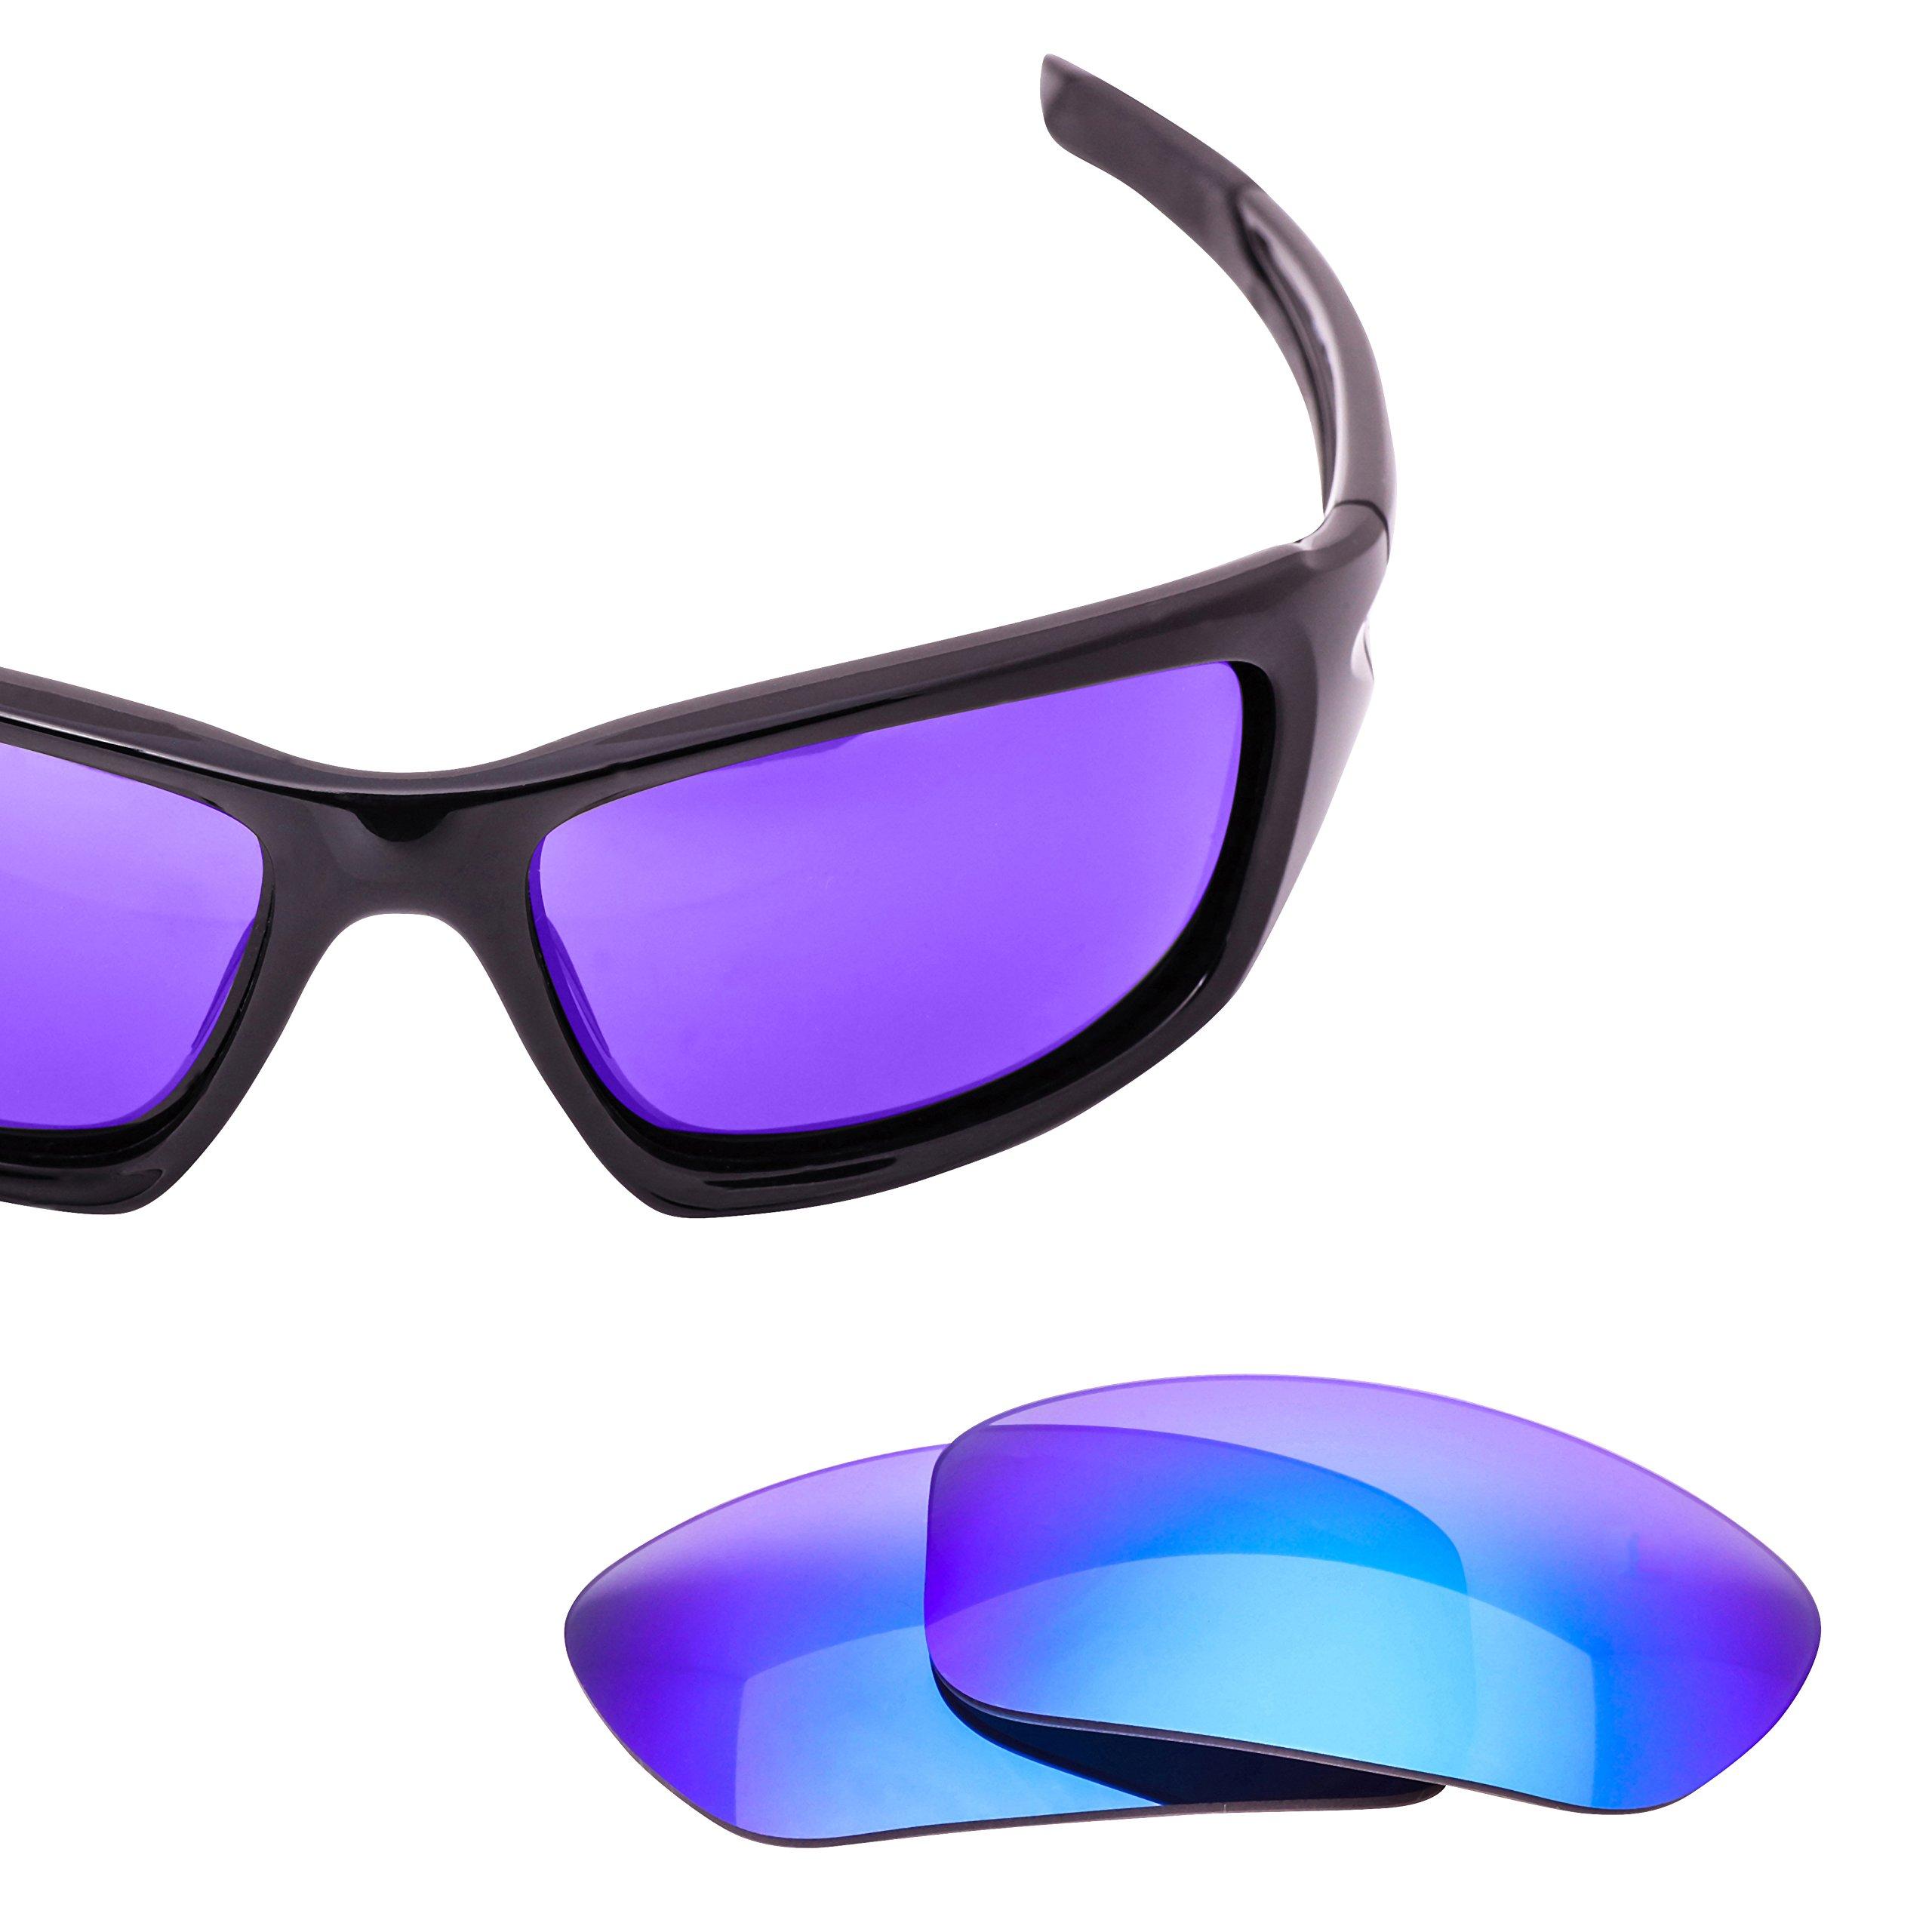 LenzFlip Replacement Lenses for Oakley VALVE Sunglass Frame - Gray Polarized with Blue Mirror Lenses